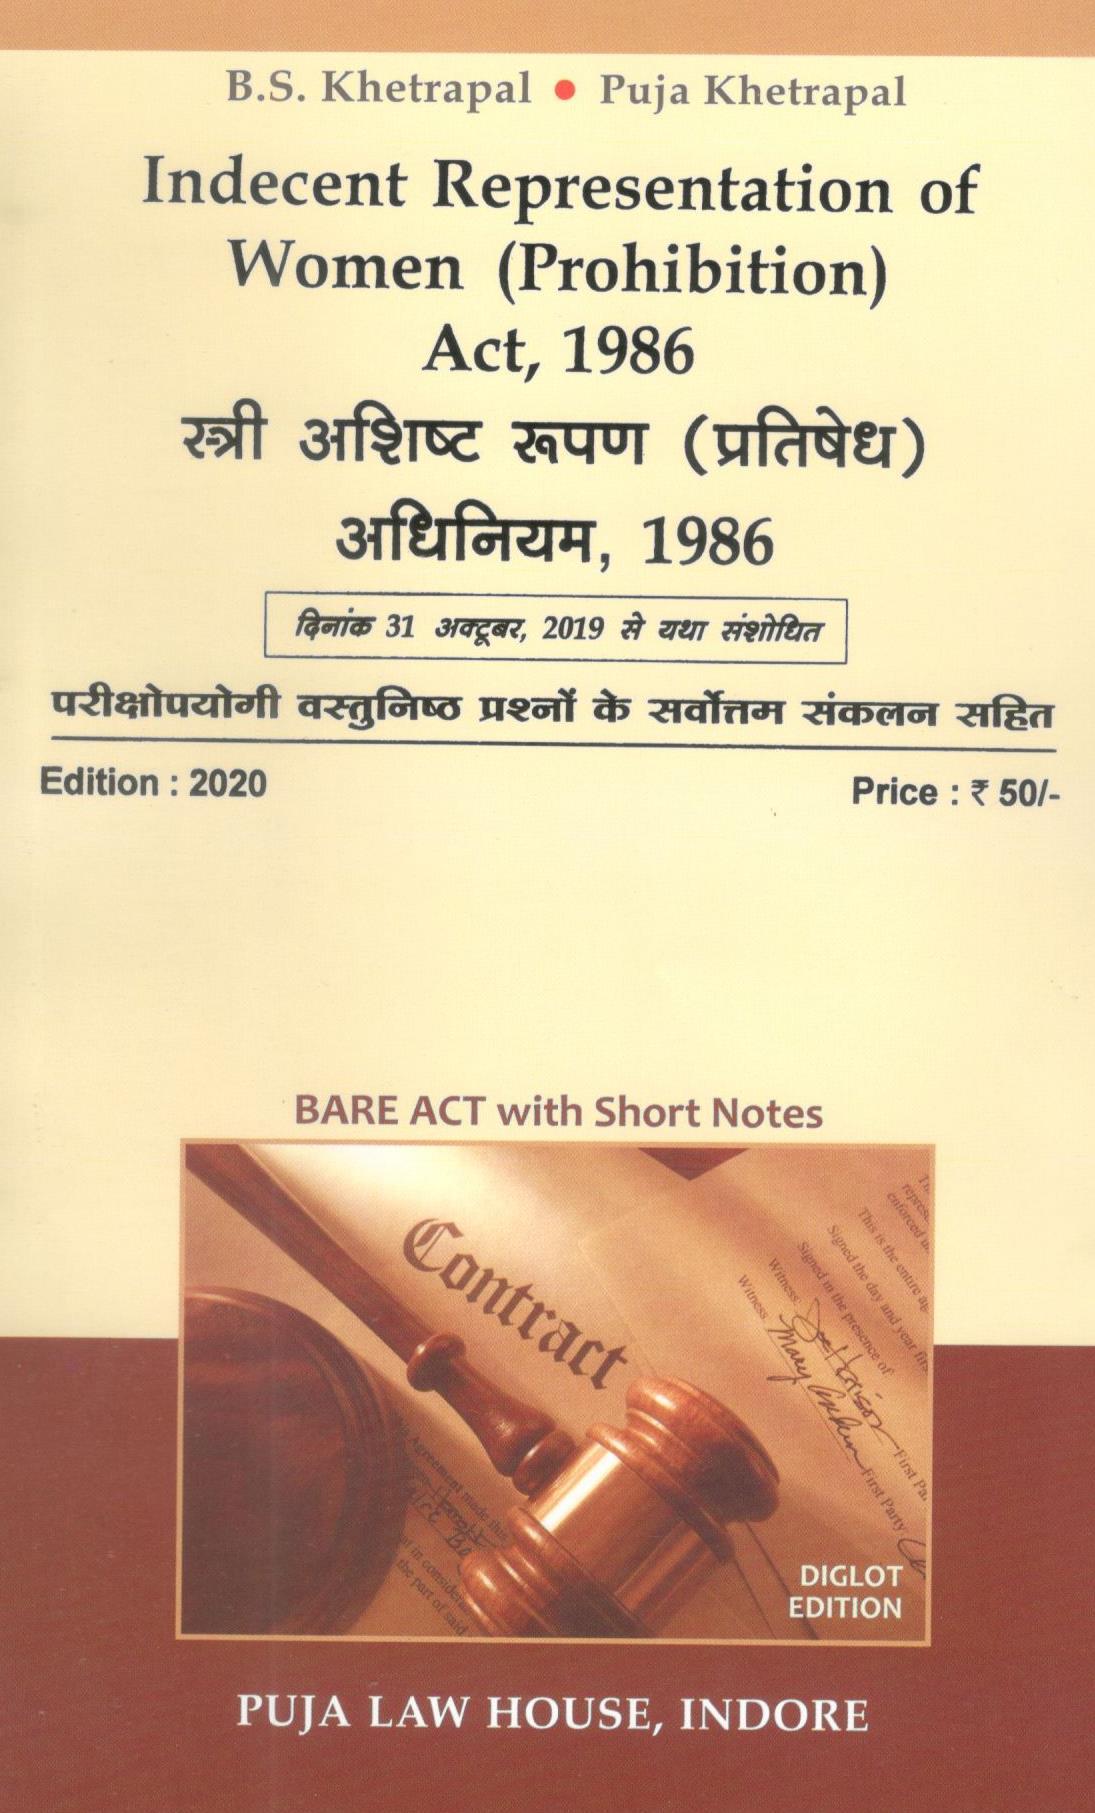 स्त्री अशिष्ट रूपण (प्रतिषेध) अधिनियम, 1986 / Indecent Representation of Women (Prohibition) Act, 1986